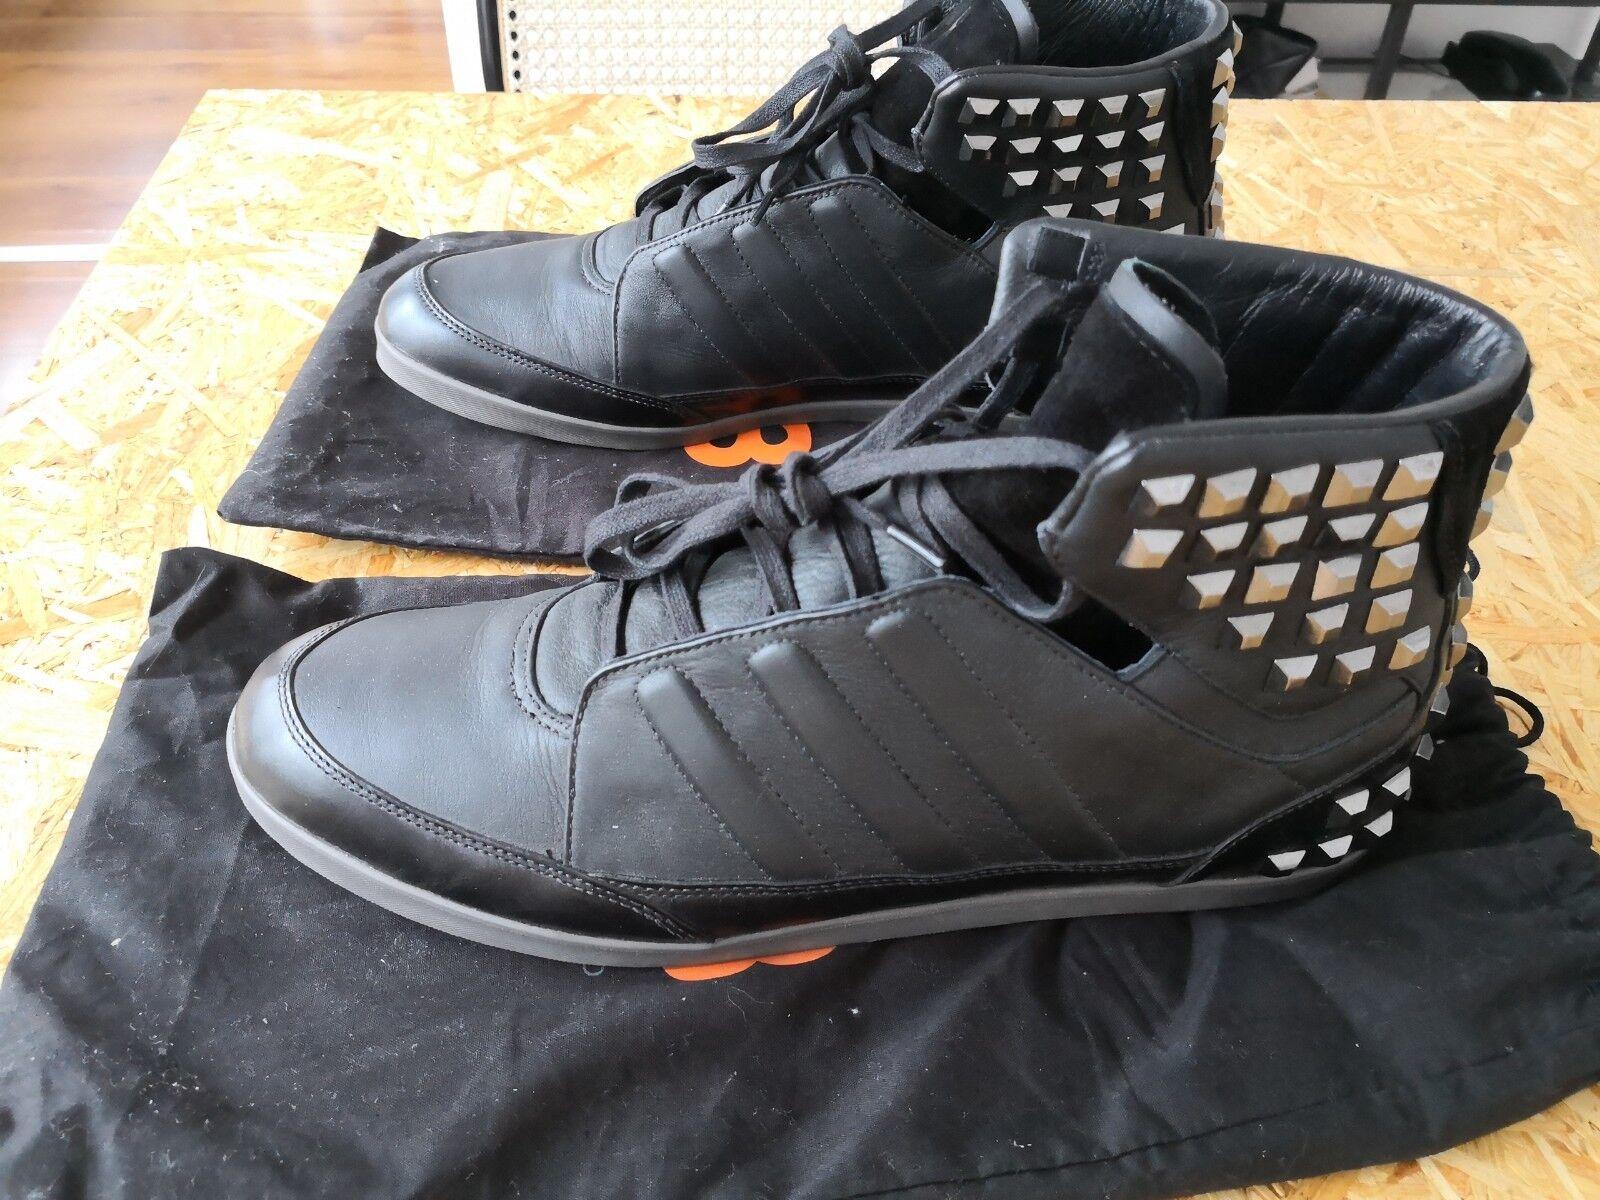 Adidas Y3 Honja Hi schwarz Y-3 Turnschuhe high Leder schwarz Nieten wie neu